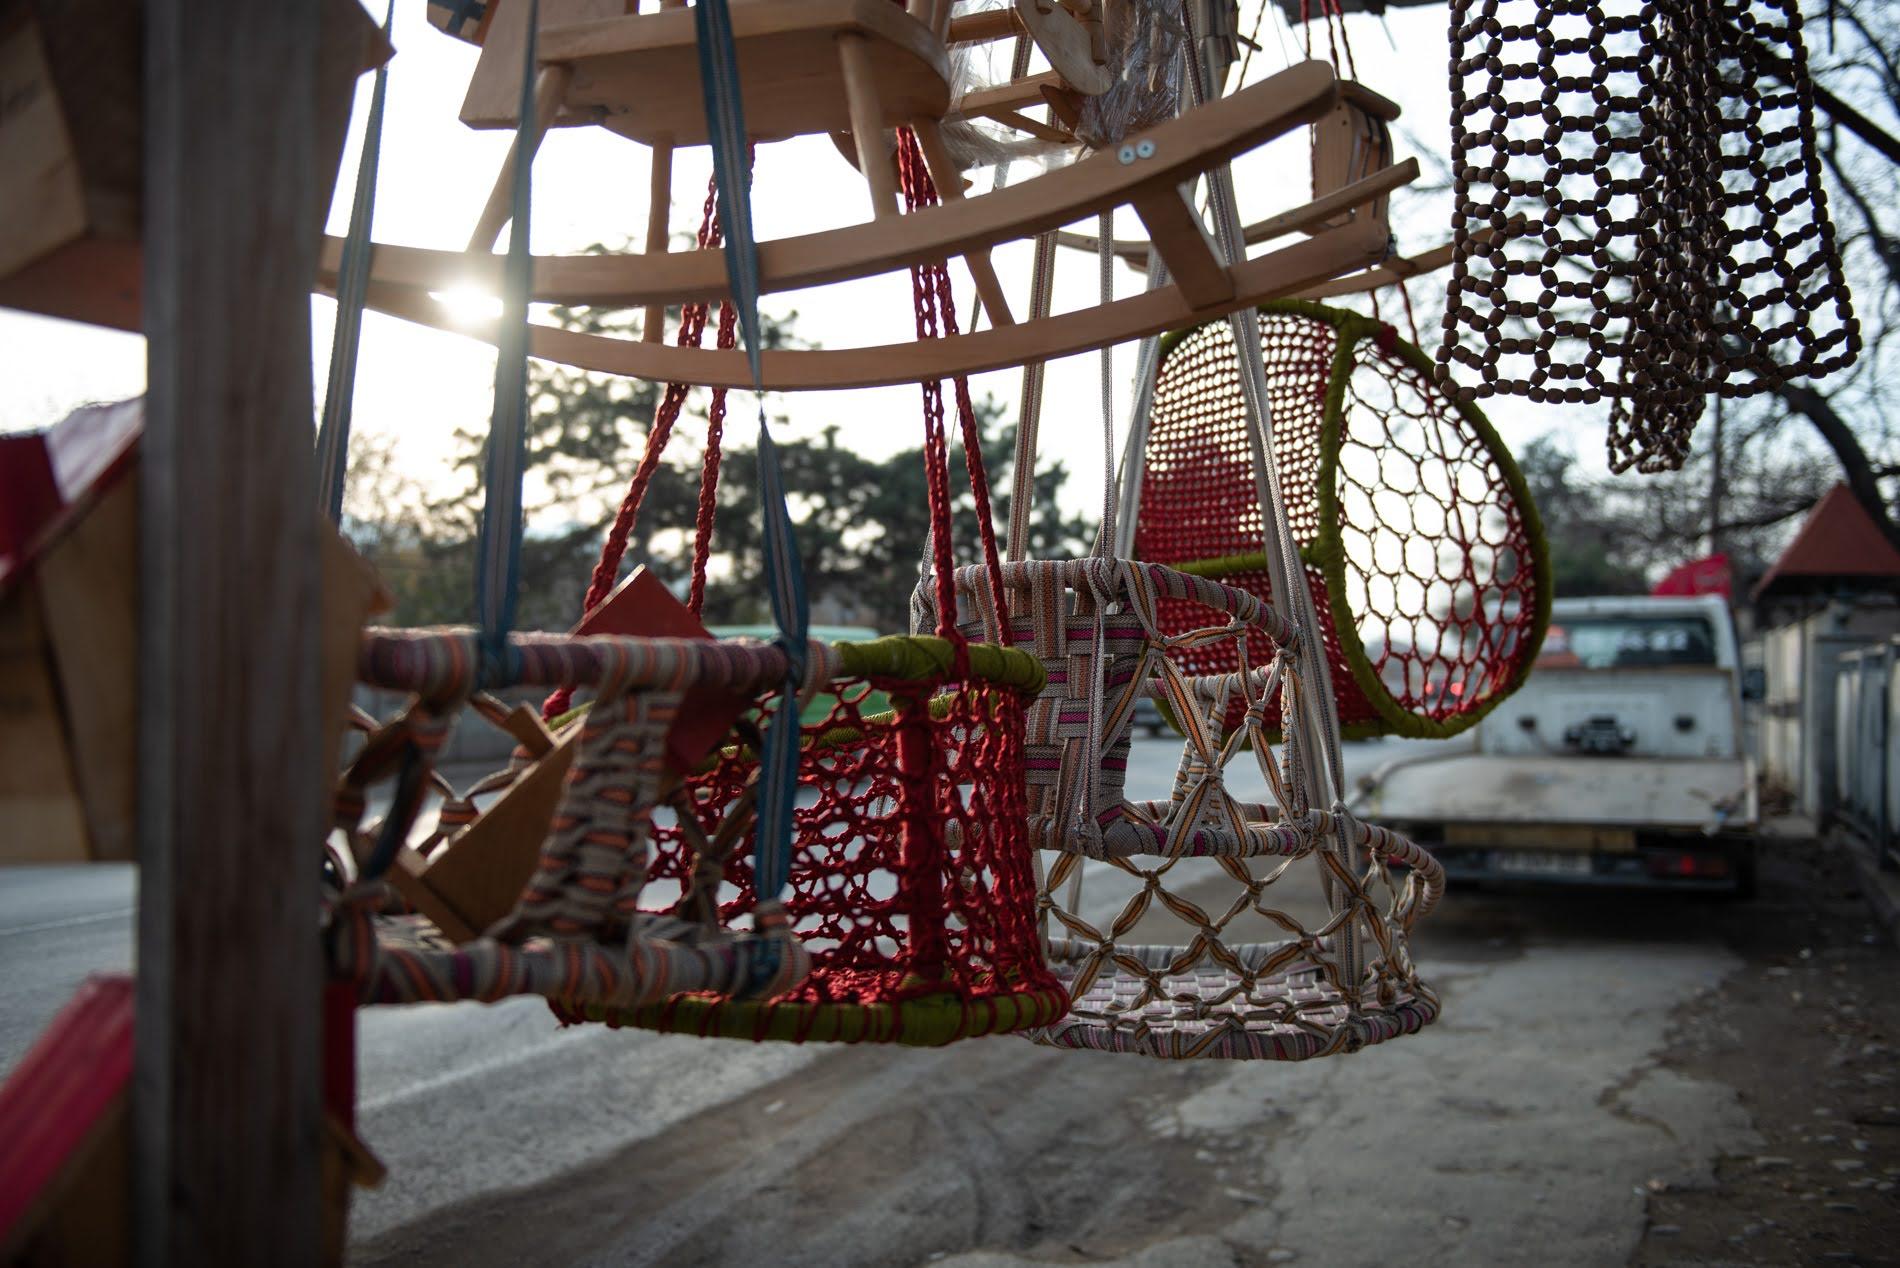 Khashuri, previously a city of hammocks, barely sells anything now. Tamuna Chkareuli/OC Media.